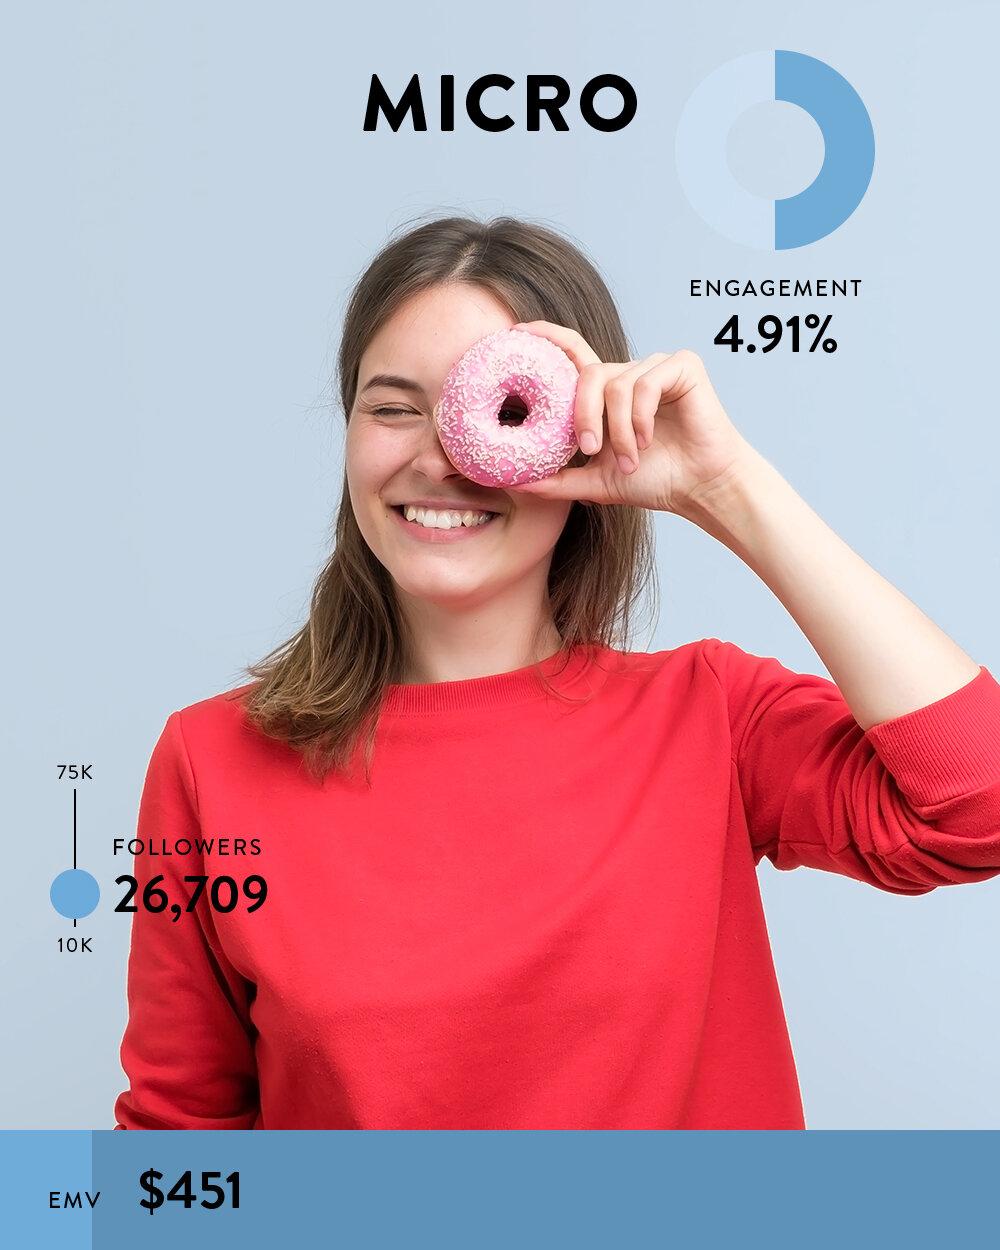 influencer-infographic-micro.jpg